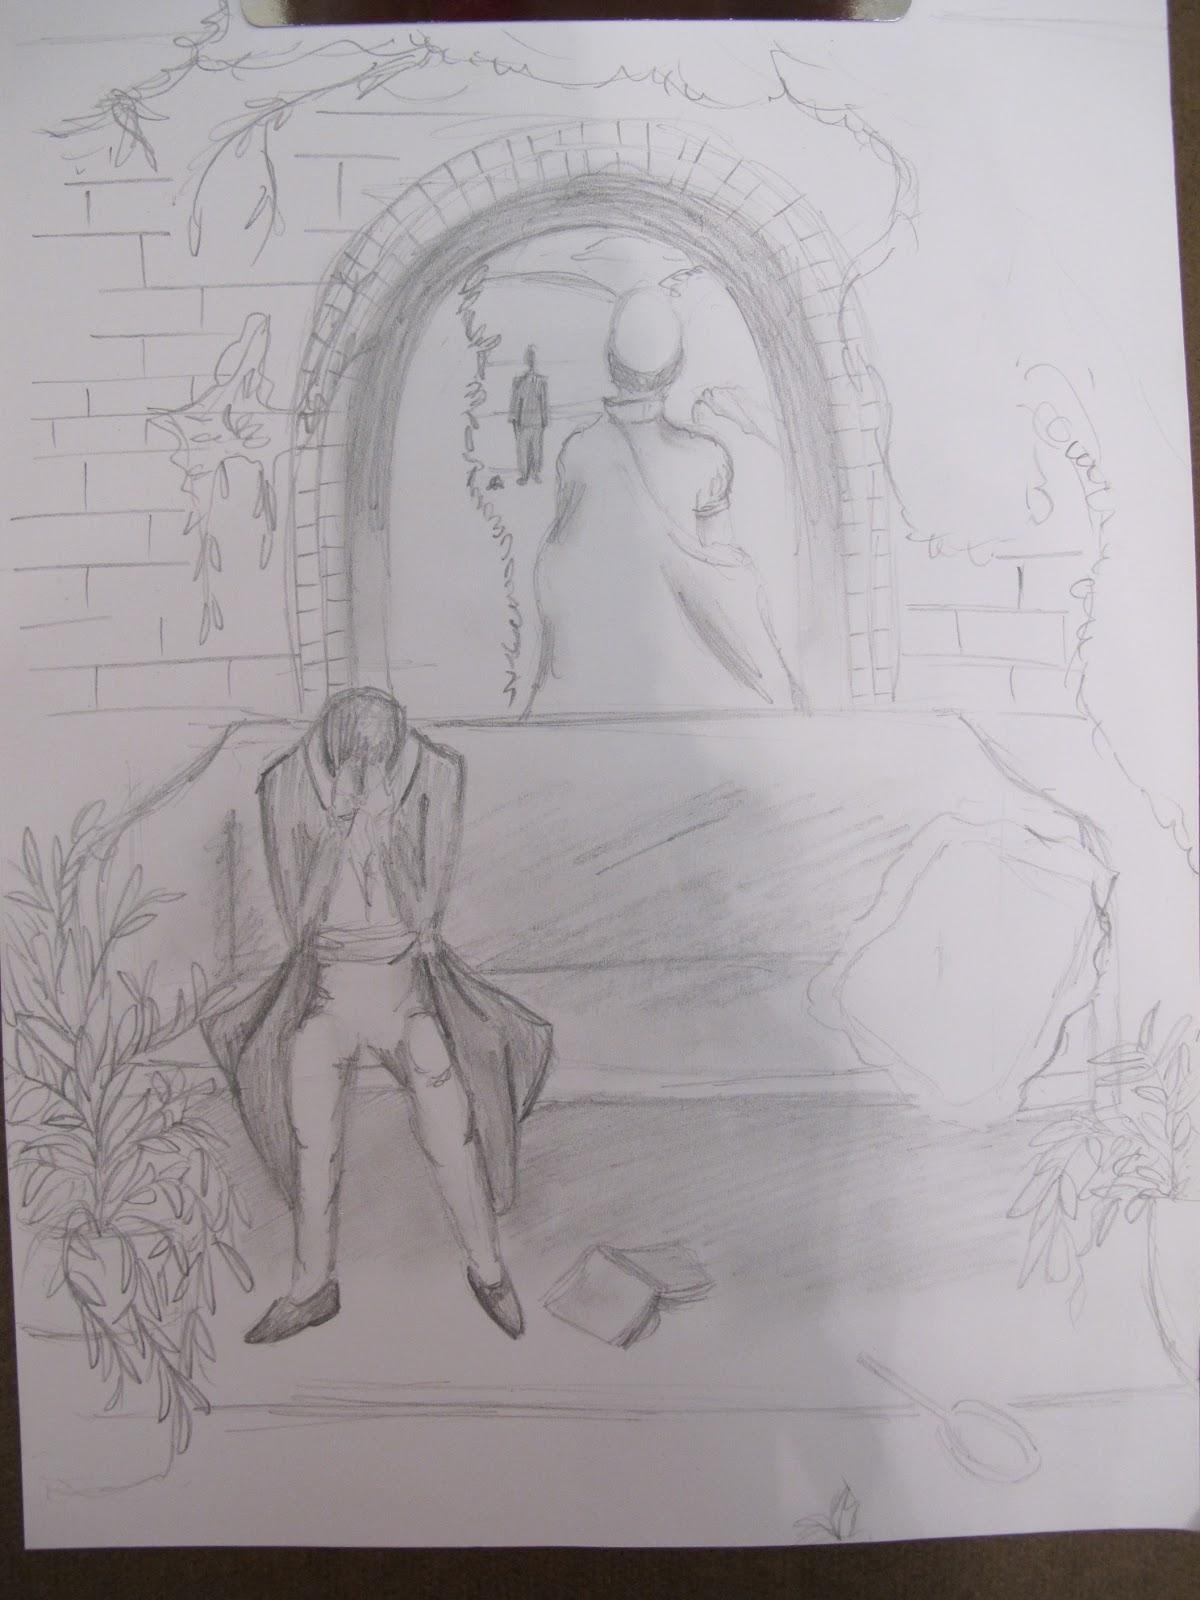 http://rfacdn.nz/artgallery/assets/media/blog-drop-in-drawing-stay-2.jpg